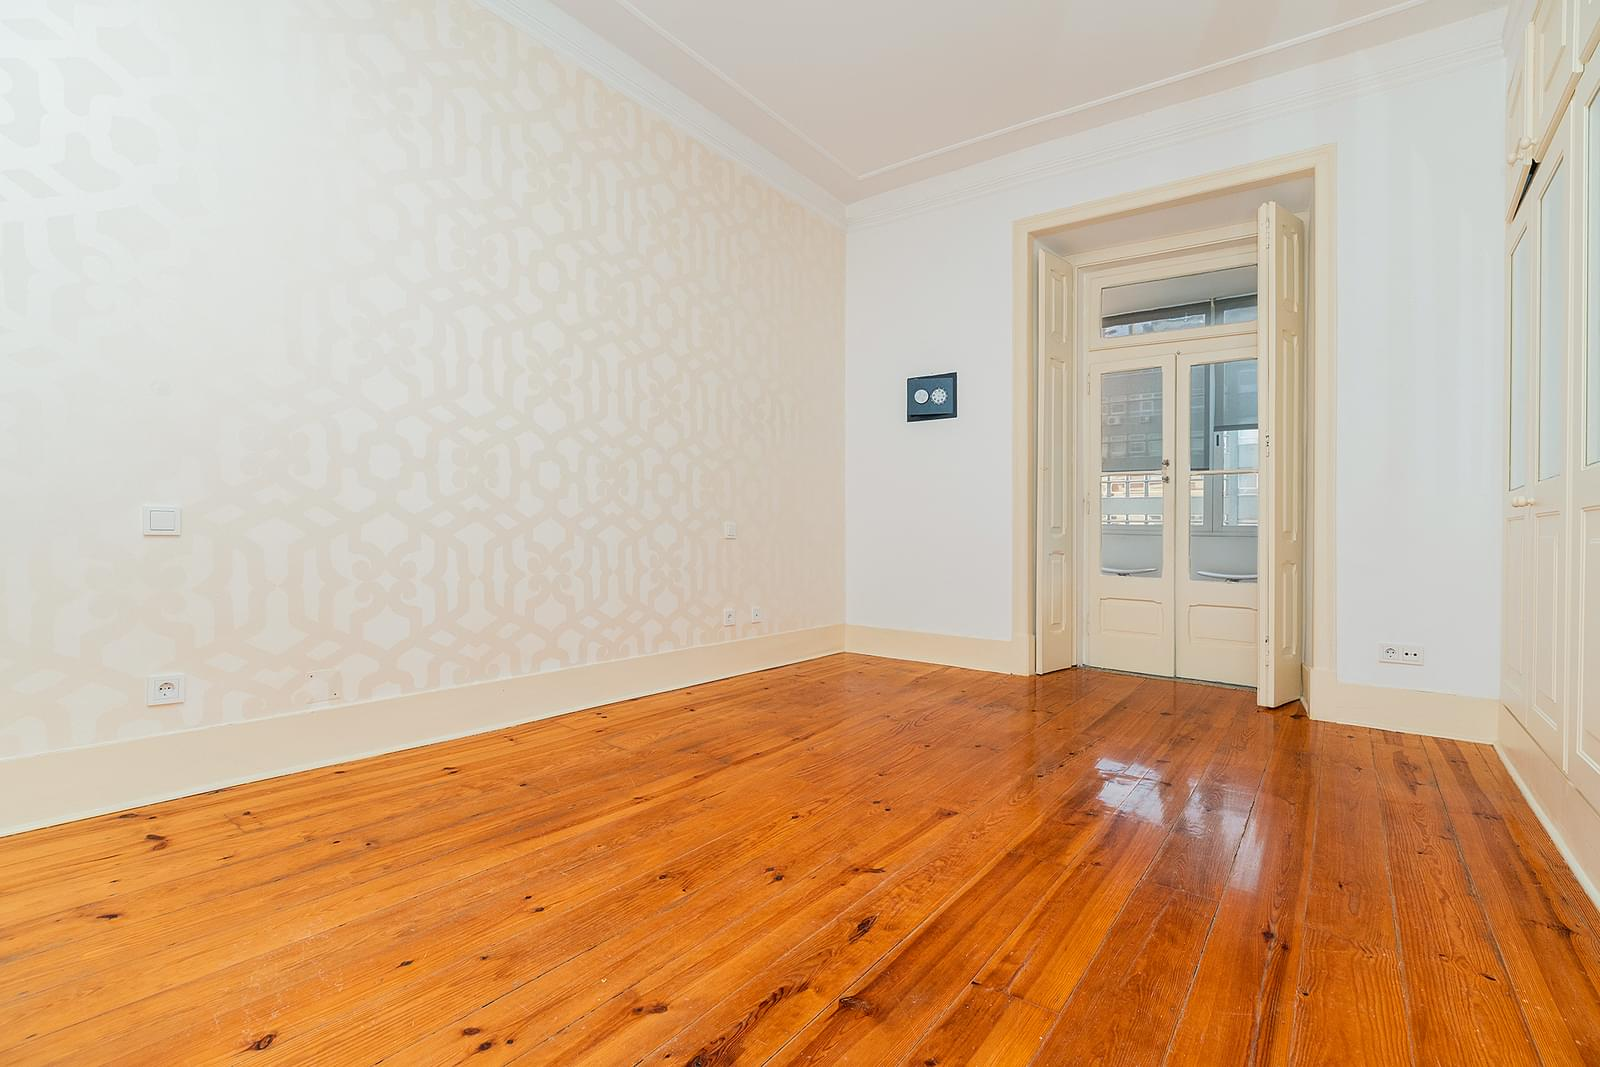 pf18723-apartamento-t3-1-lisboa-b58cabc2-6caf-4103-b8b5-2ed202e62c4a